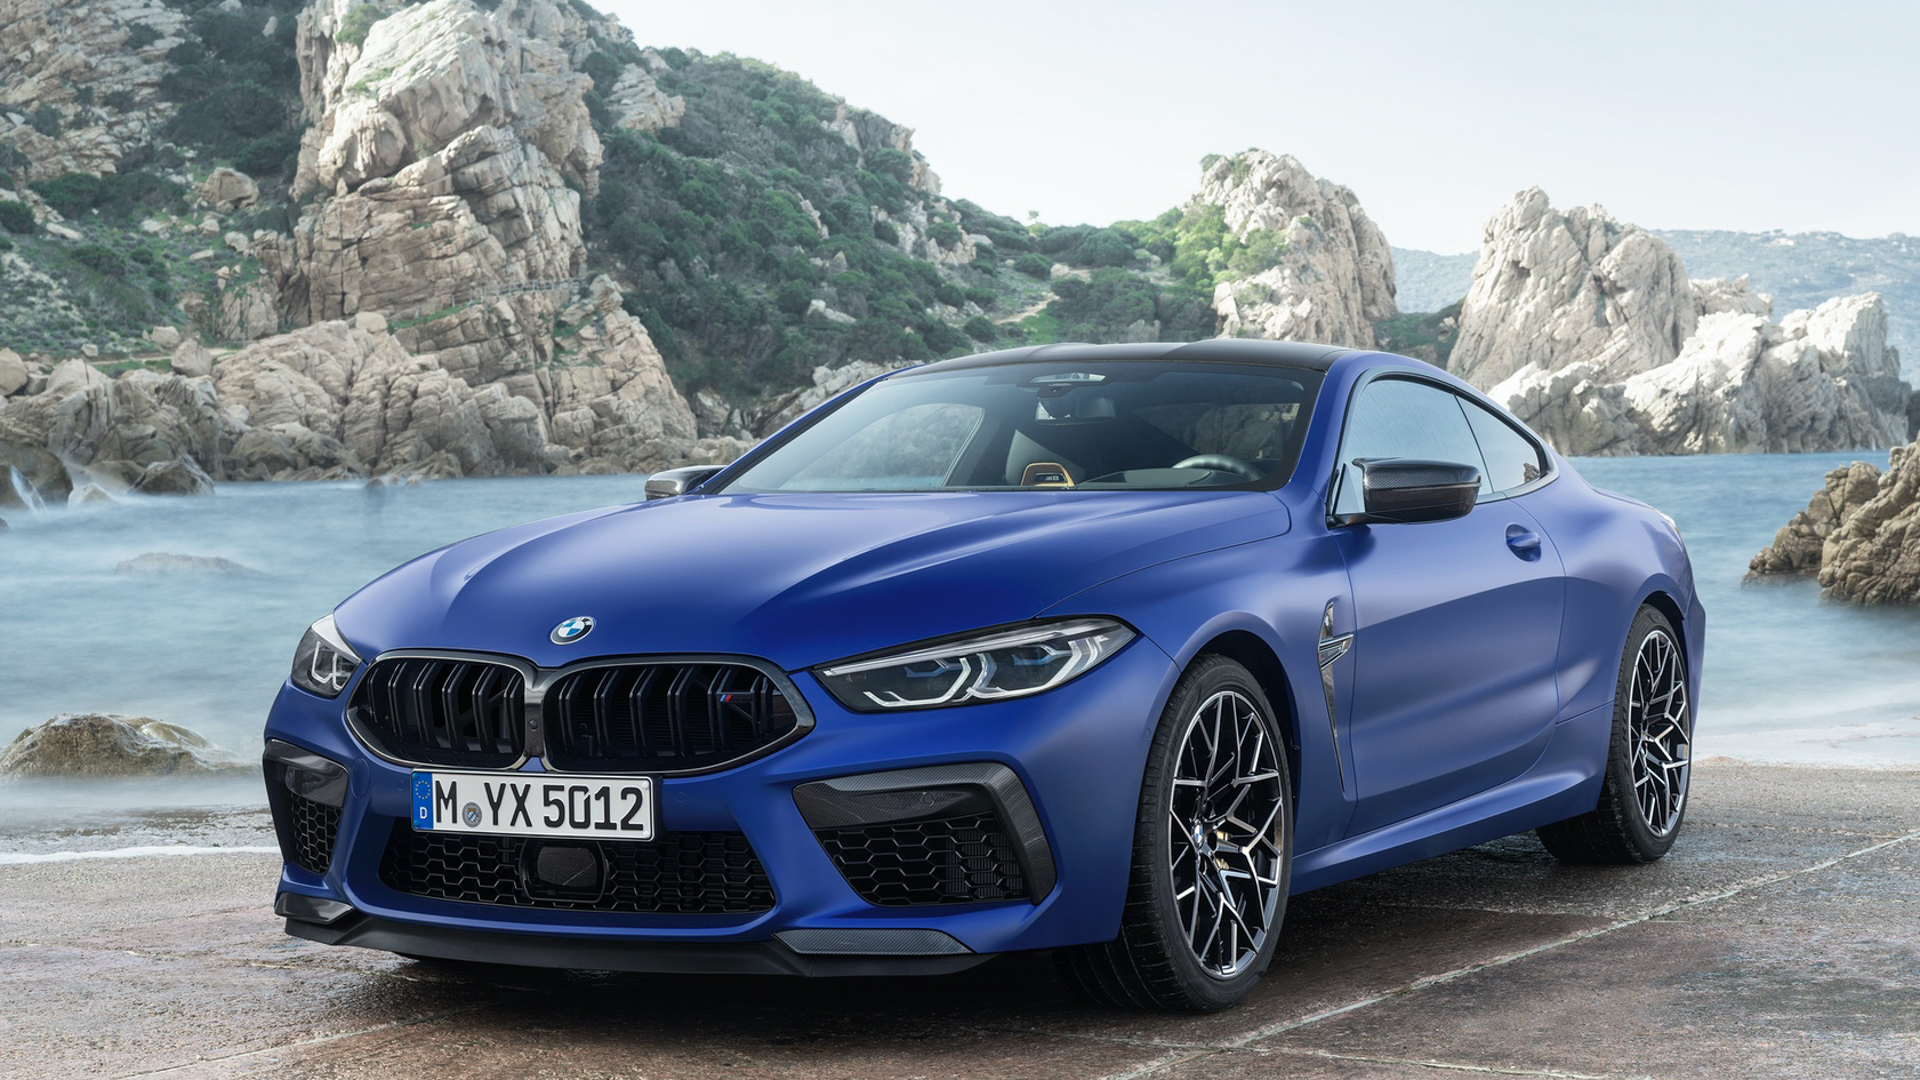 BMW M8 Coupe vs Aston Martin DBS Superleggera 7 of 9